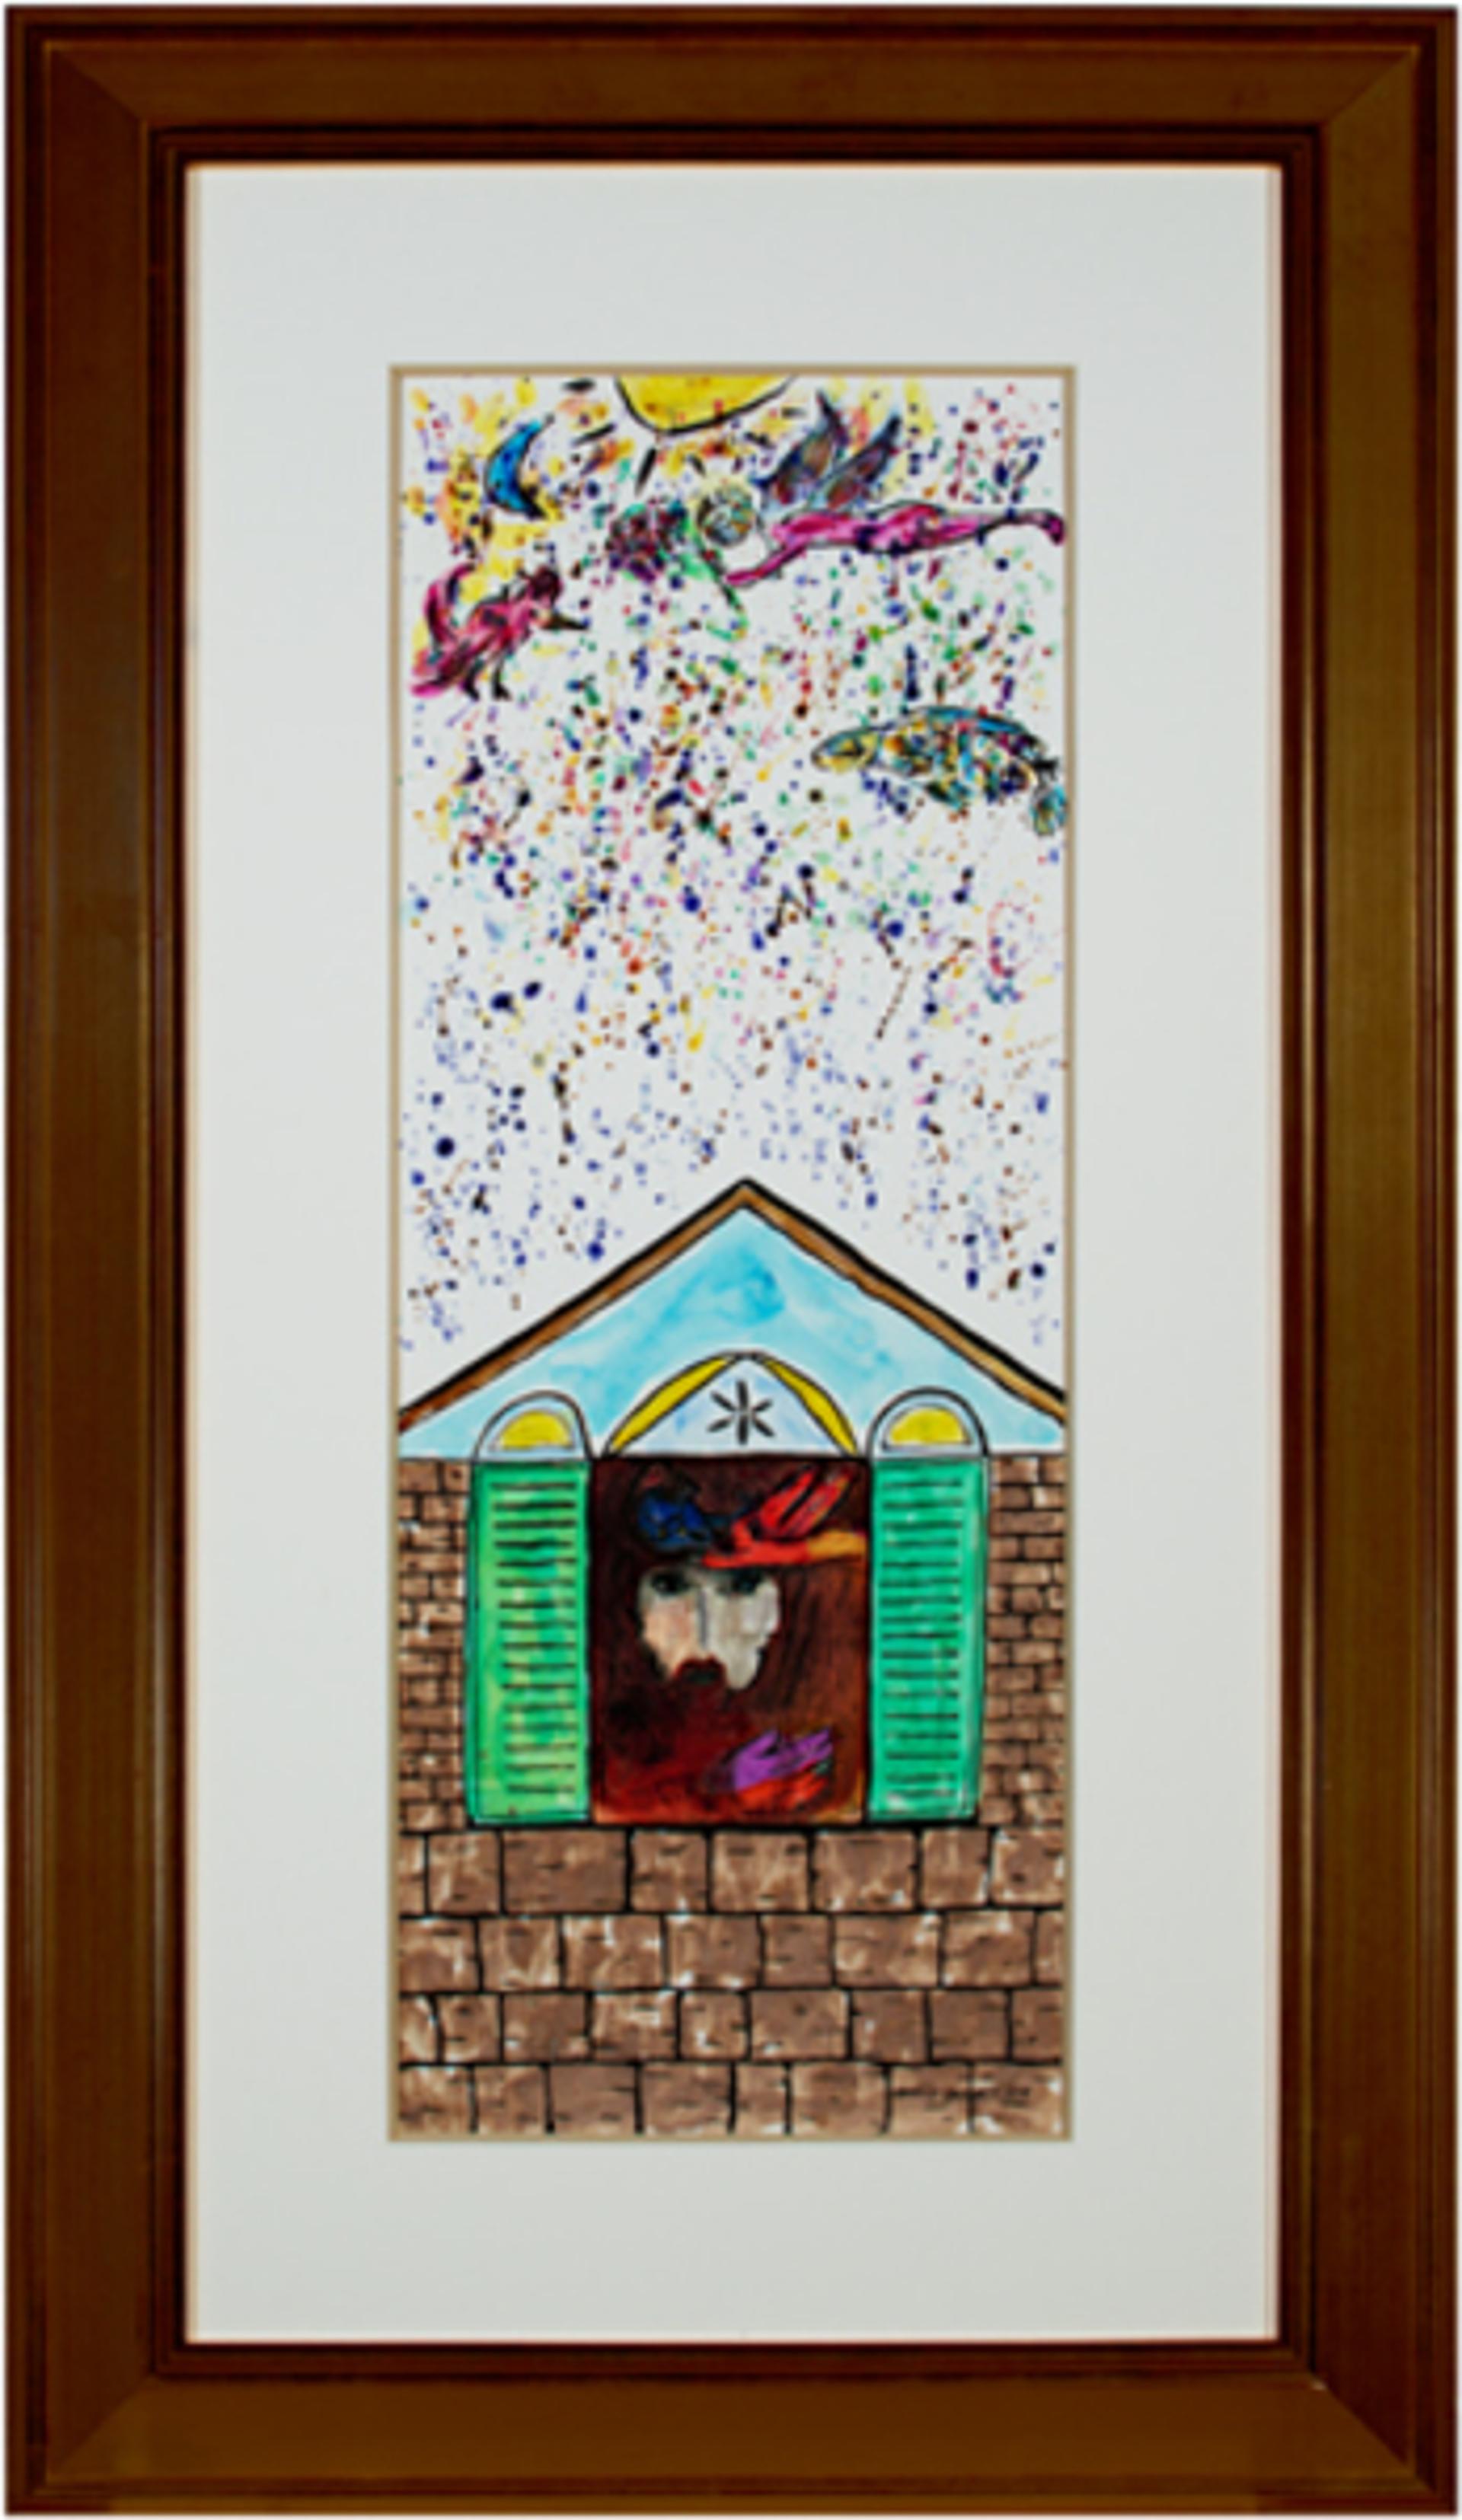 Homage to Chagall:  David & Bathsheba Sunrise Celebration by David Barnett